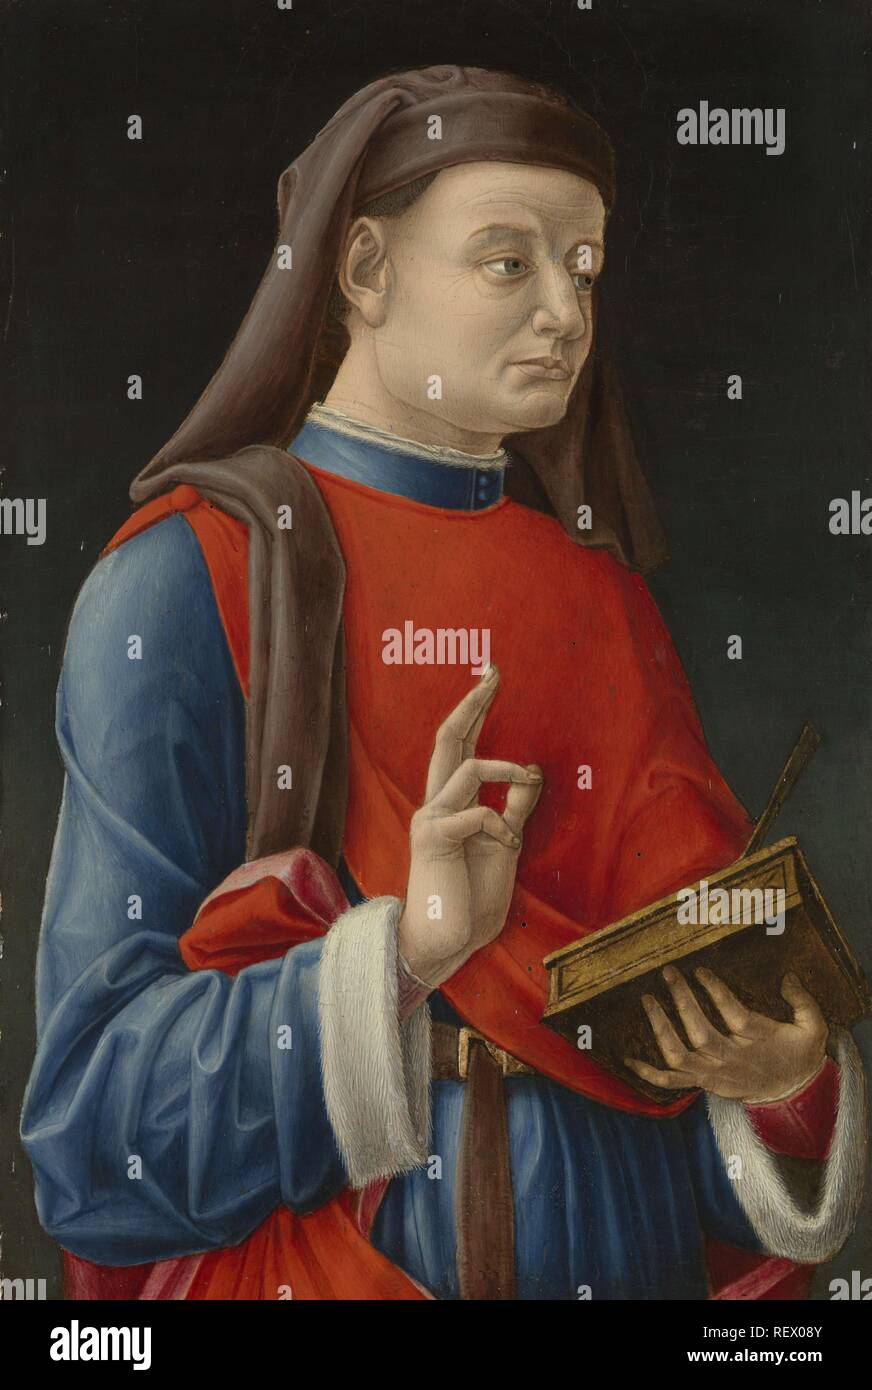 Saint Cosmas (or Damian). Dating: 1460 - 1480. Measurements: h 49.5 cm × w 33 cm; d 5.5 cm. Museum: Rijksmuseum, Amsterdam. Author: Bartolommeo Vivarini (attributed to). VIVARINI, BARTOLOMEO. Stock Photo